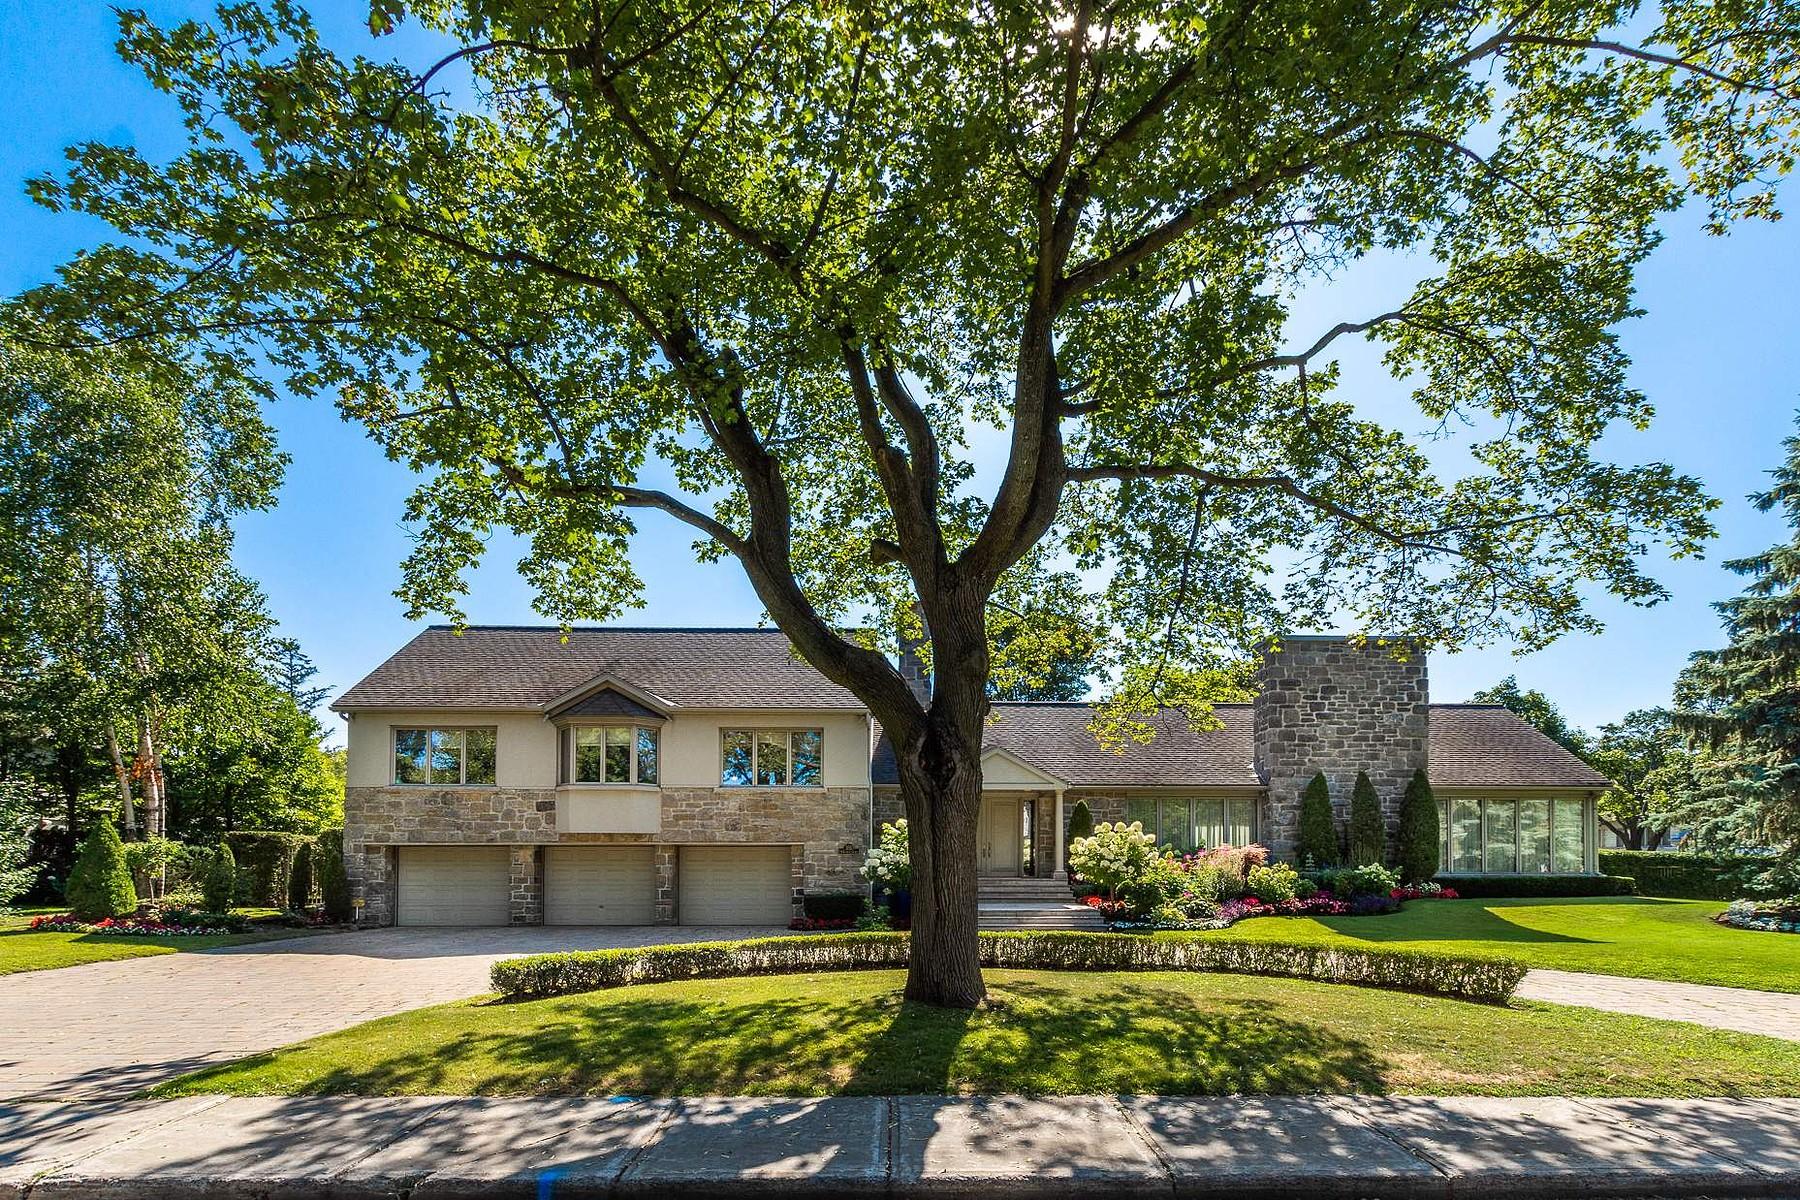 Single Family Homes for Sale at Mont-Royal, Montréal 380 Av. Morrison Mont-Royal, Quebec H3G1K4 Canada